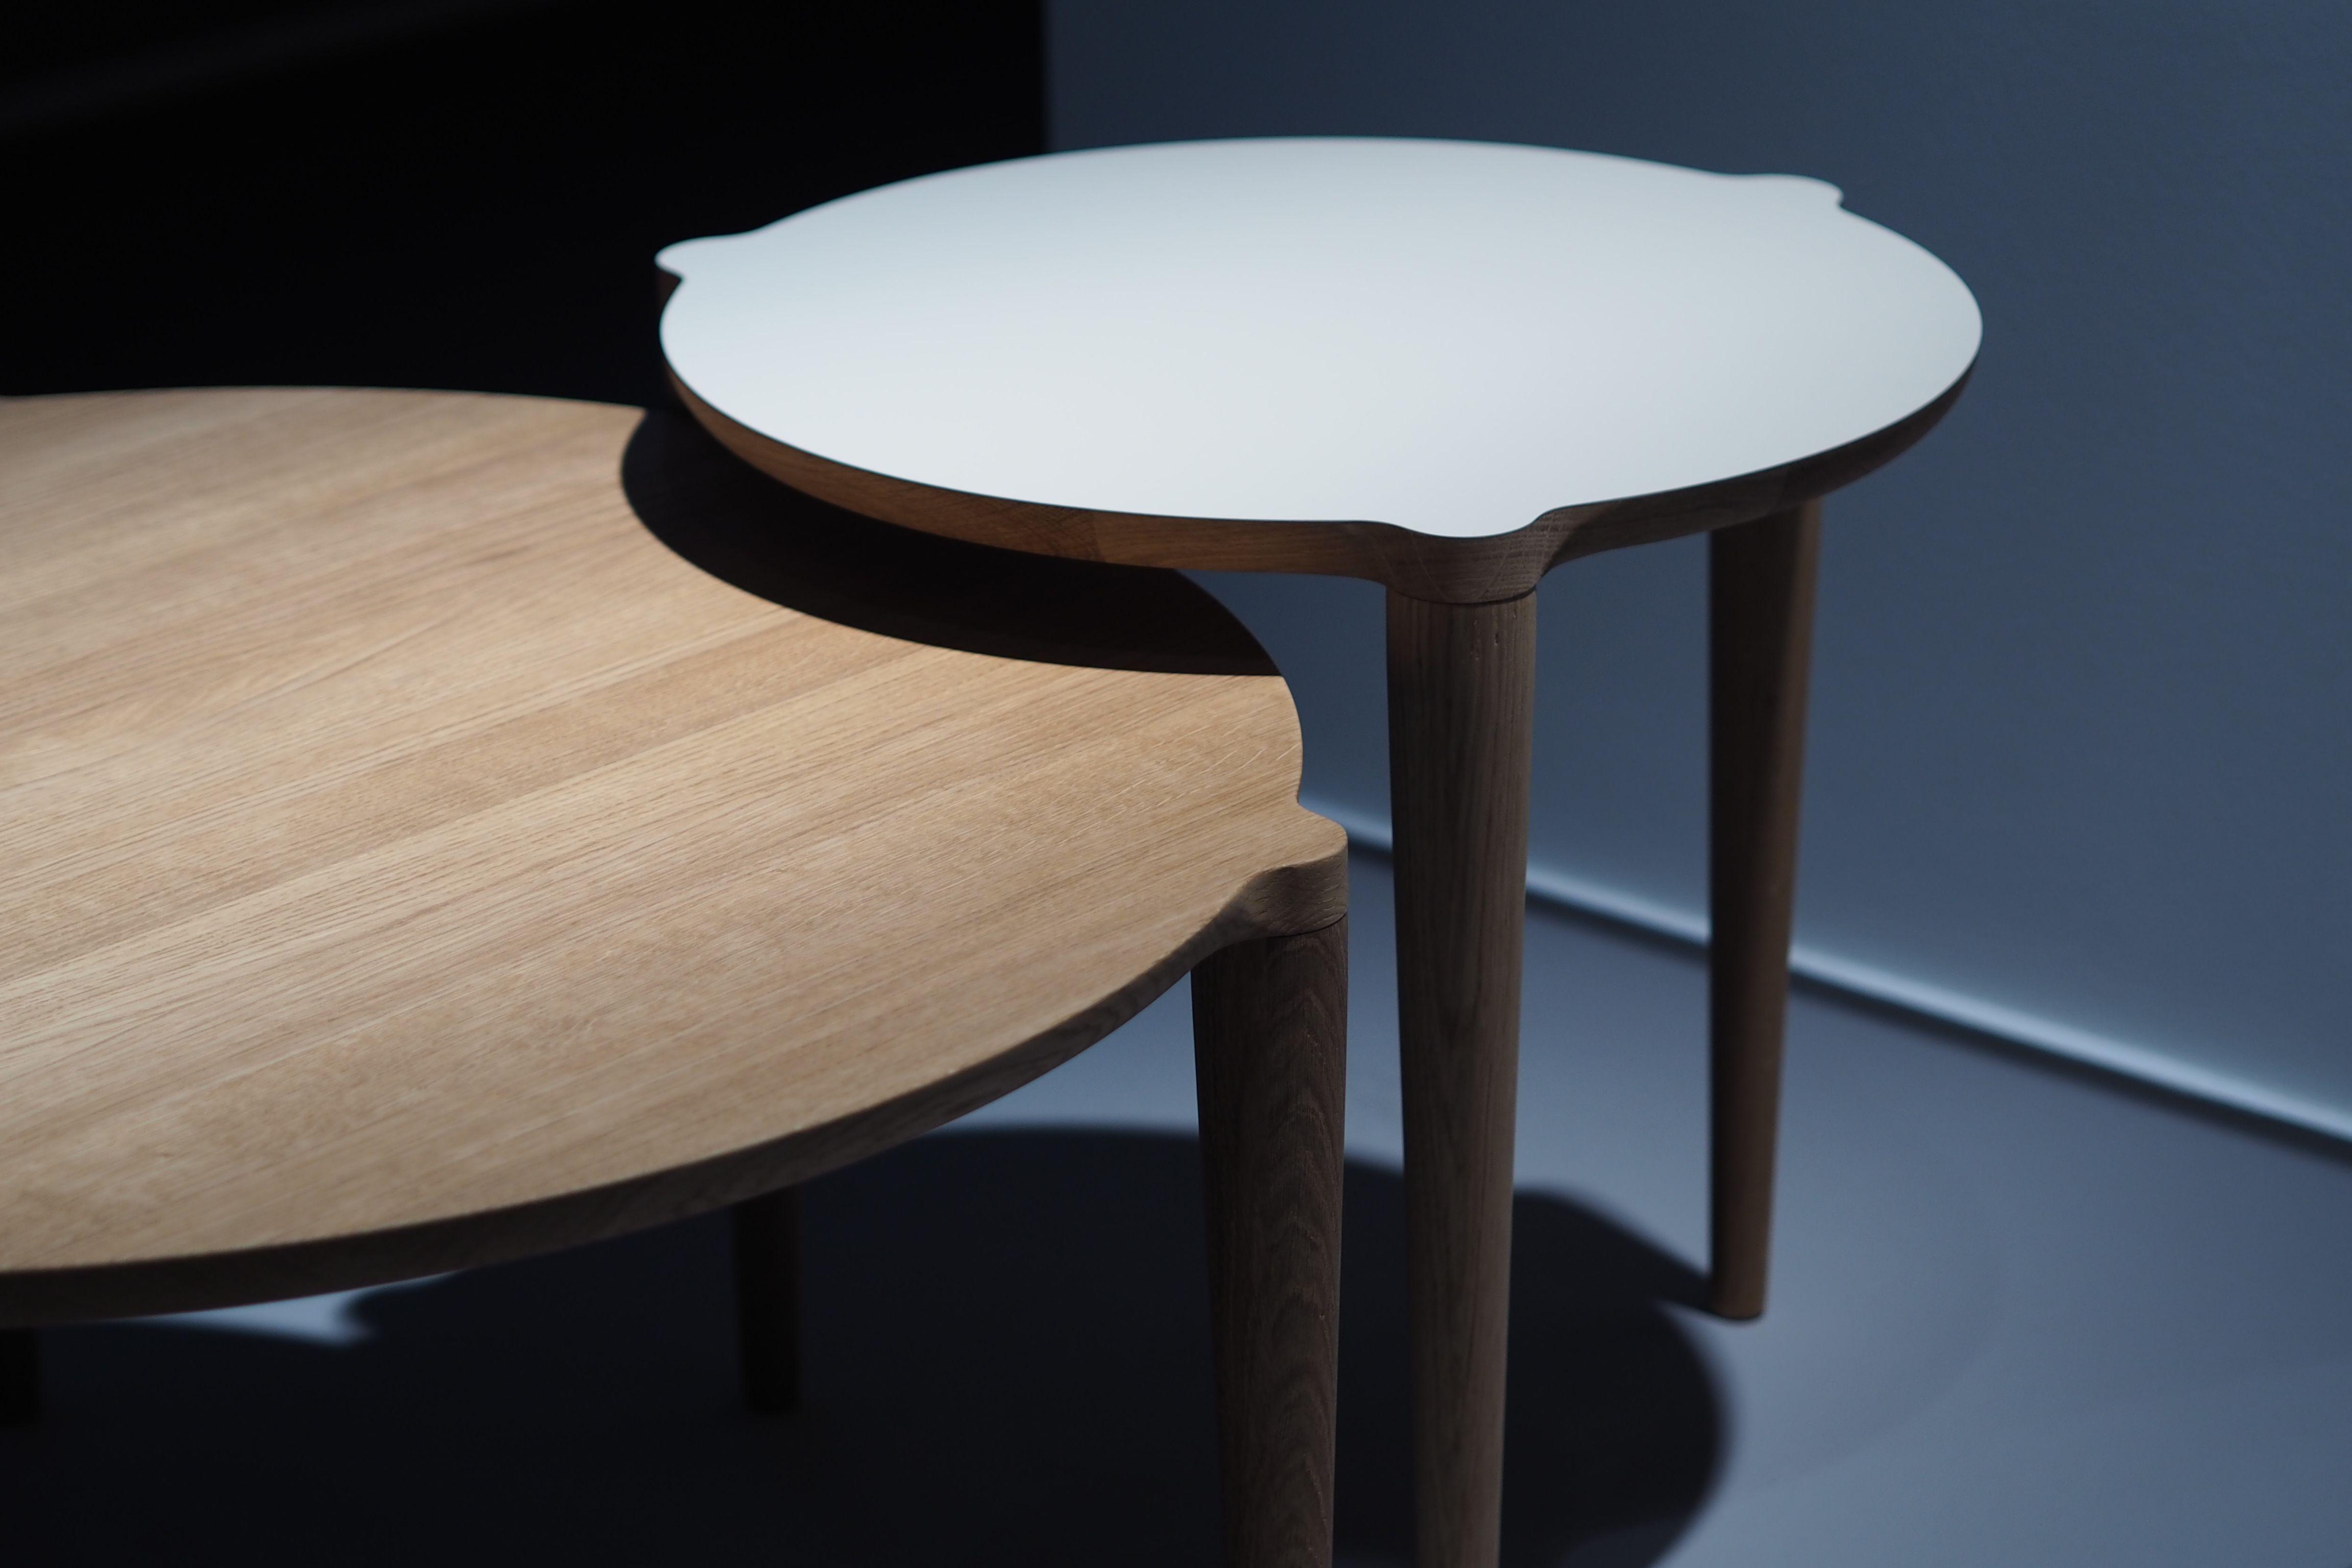 NAVER COLLECTION AK ORBIT Coffee Tables Design Nissen - Orbit coffee table